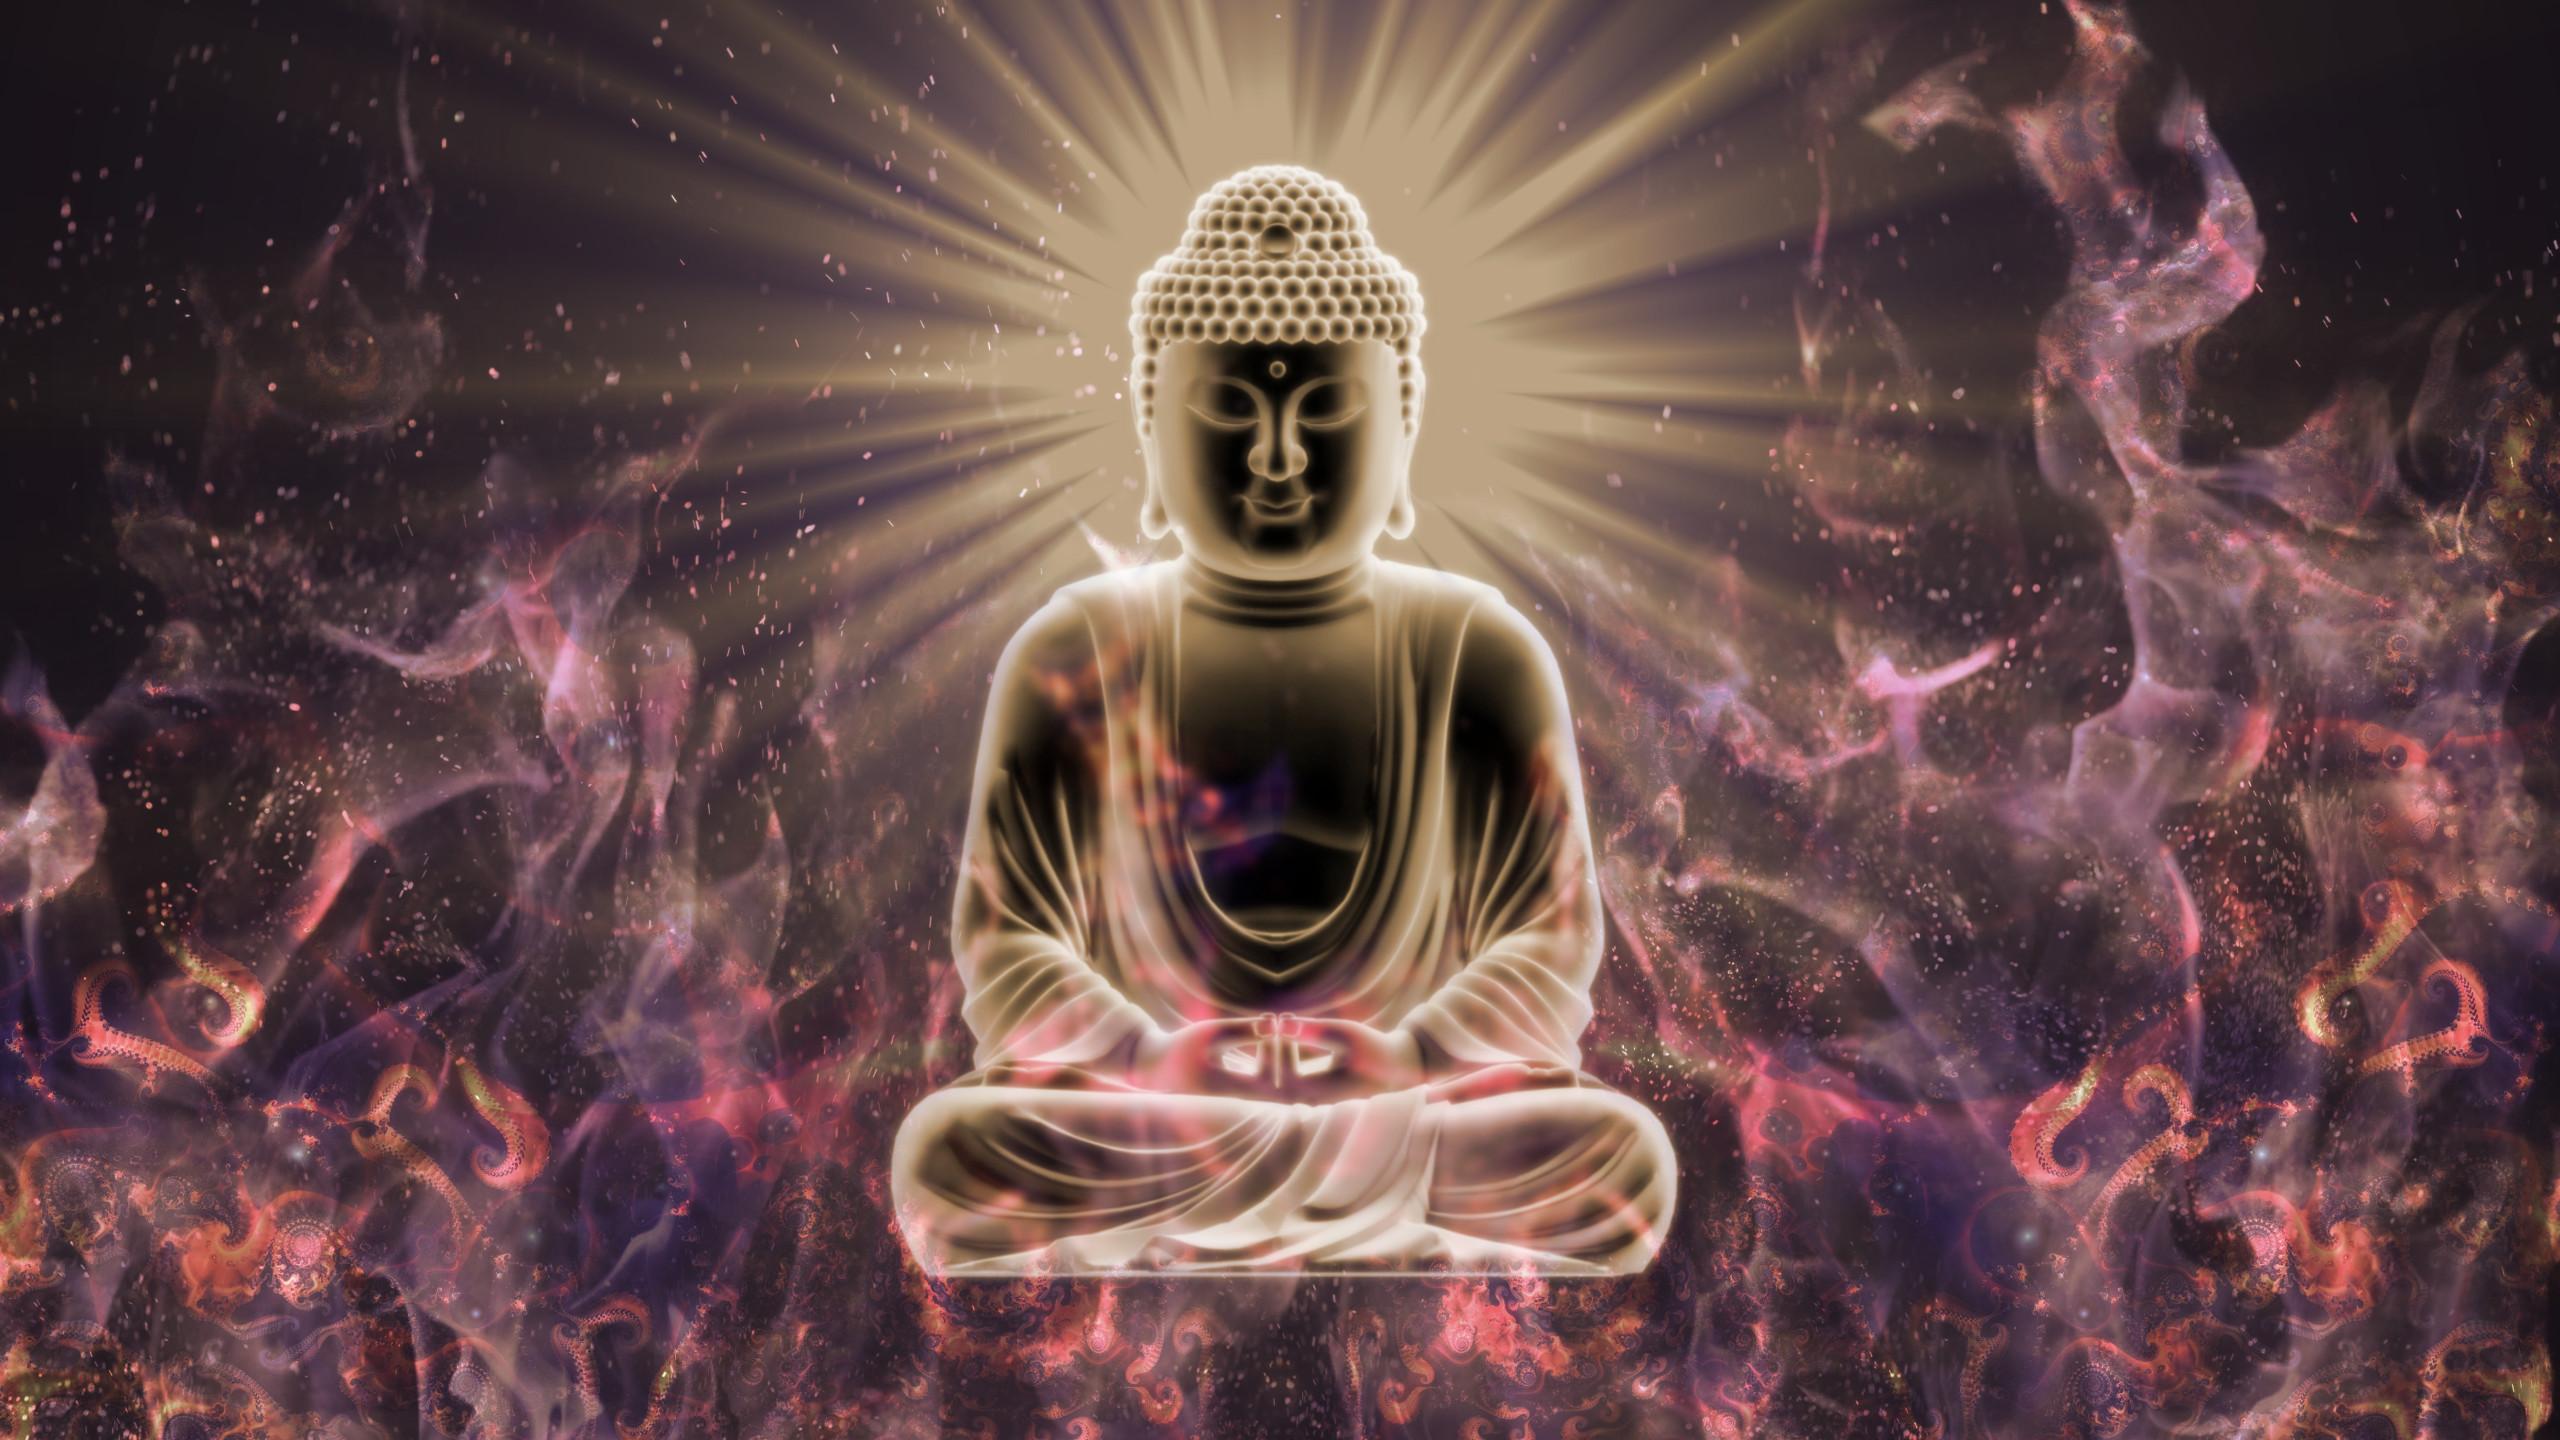 Buddhism wallpaper wallpapertag - Meditation art wallpaper ...